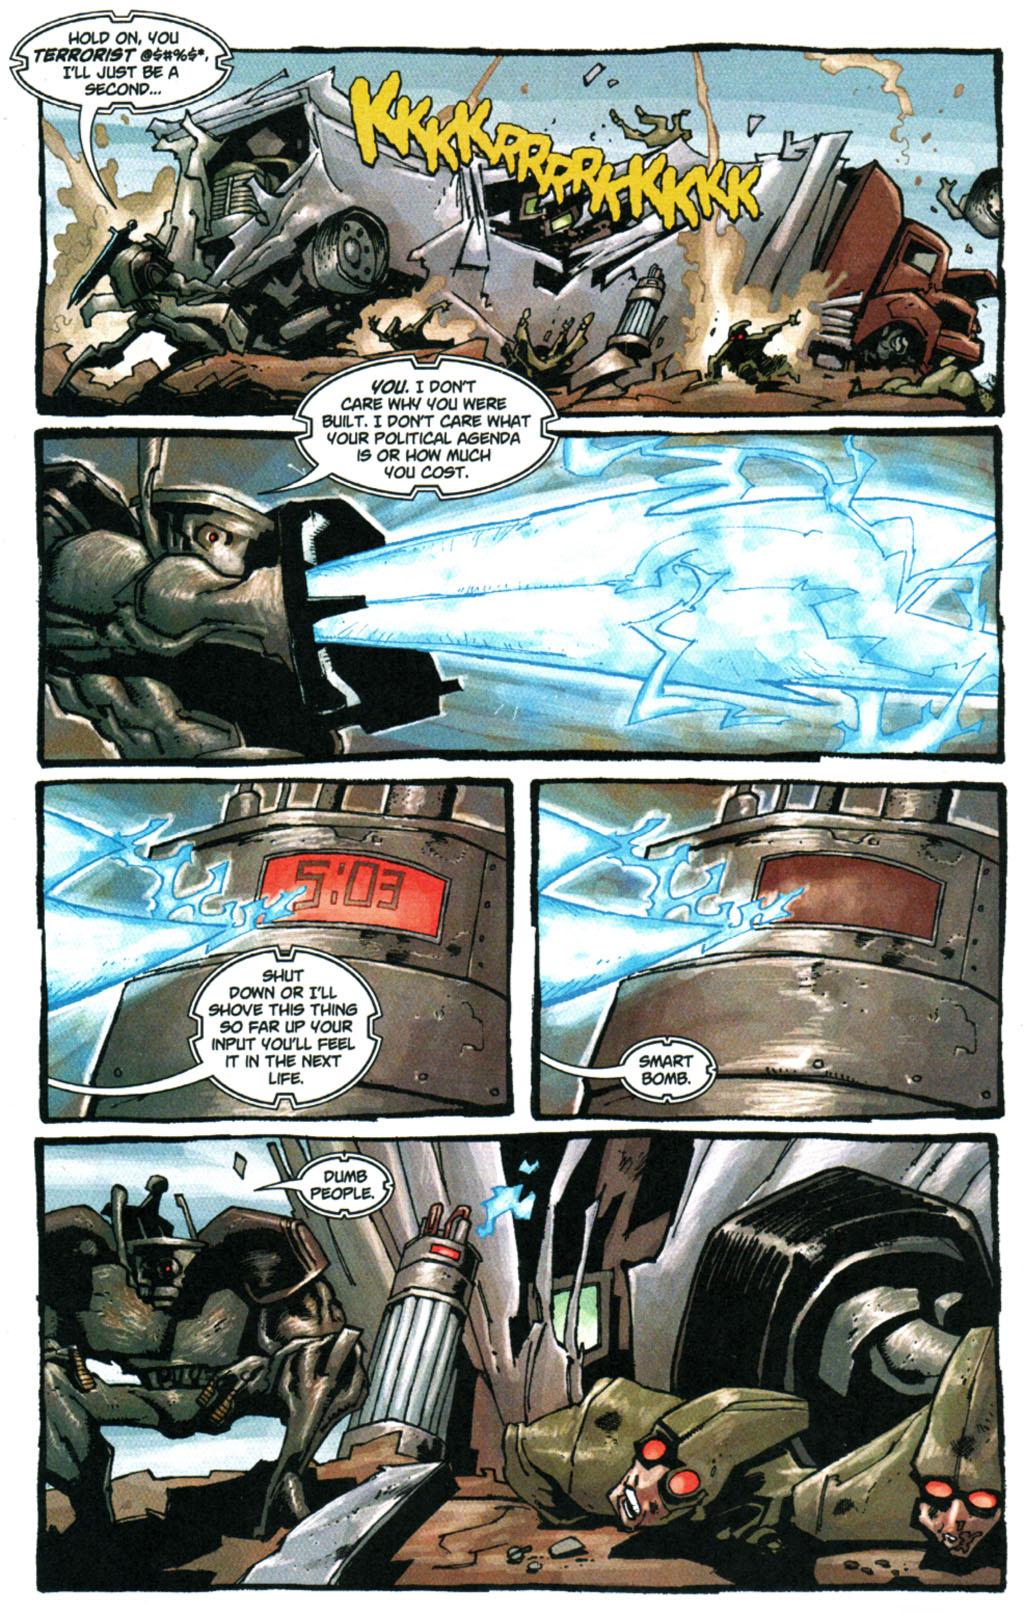 Read online Enginehead comic -  Issue #5 - 4